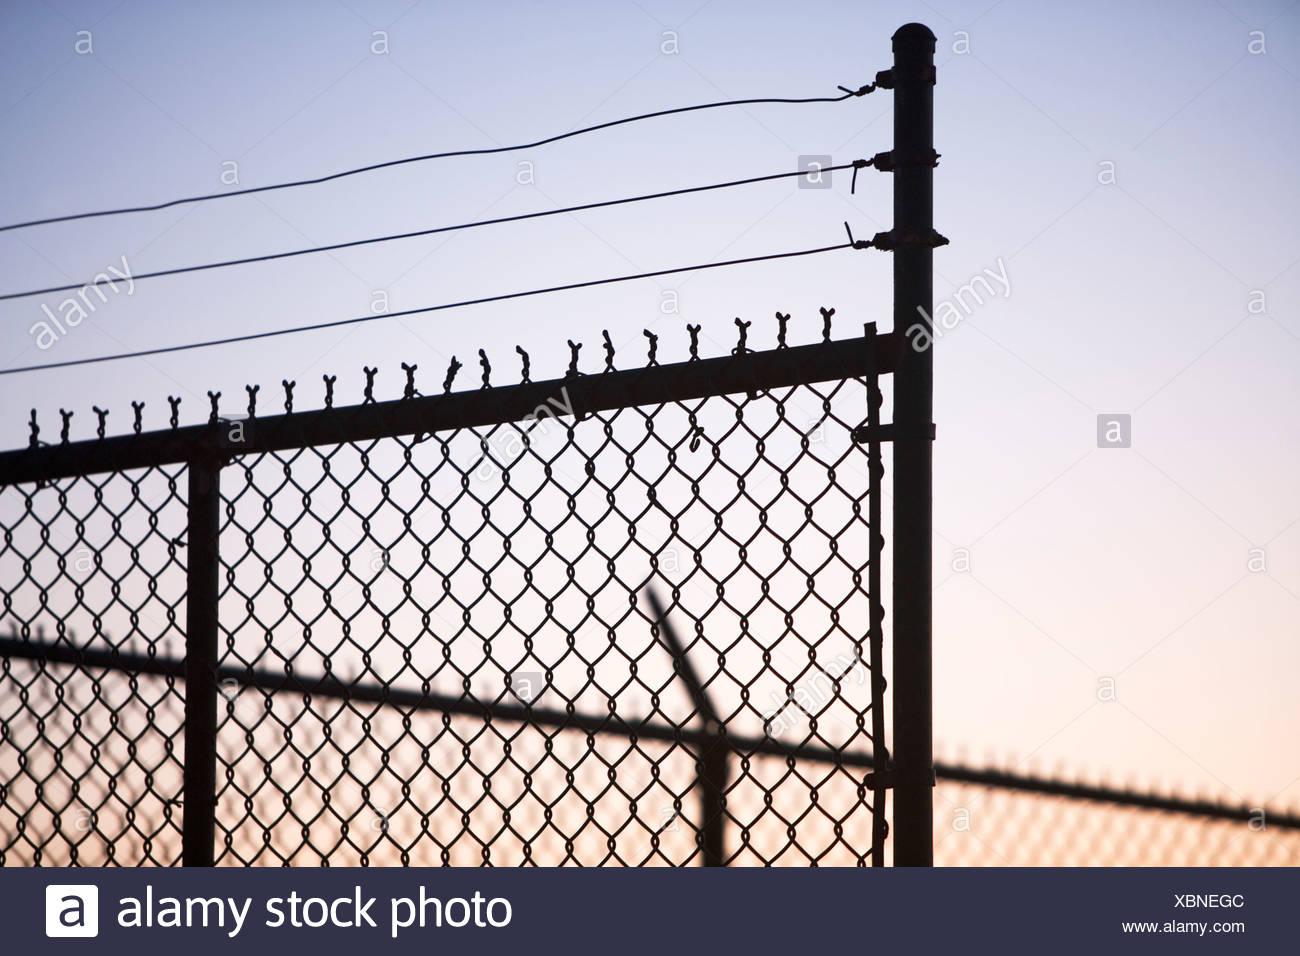 Boundary Chain Link Stockfotos & Boundary Chain Link Bilder - Alamy